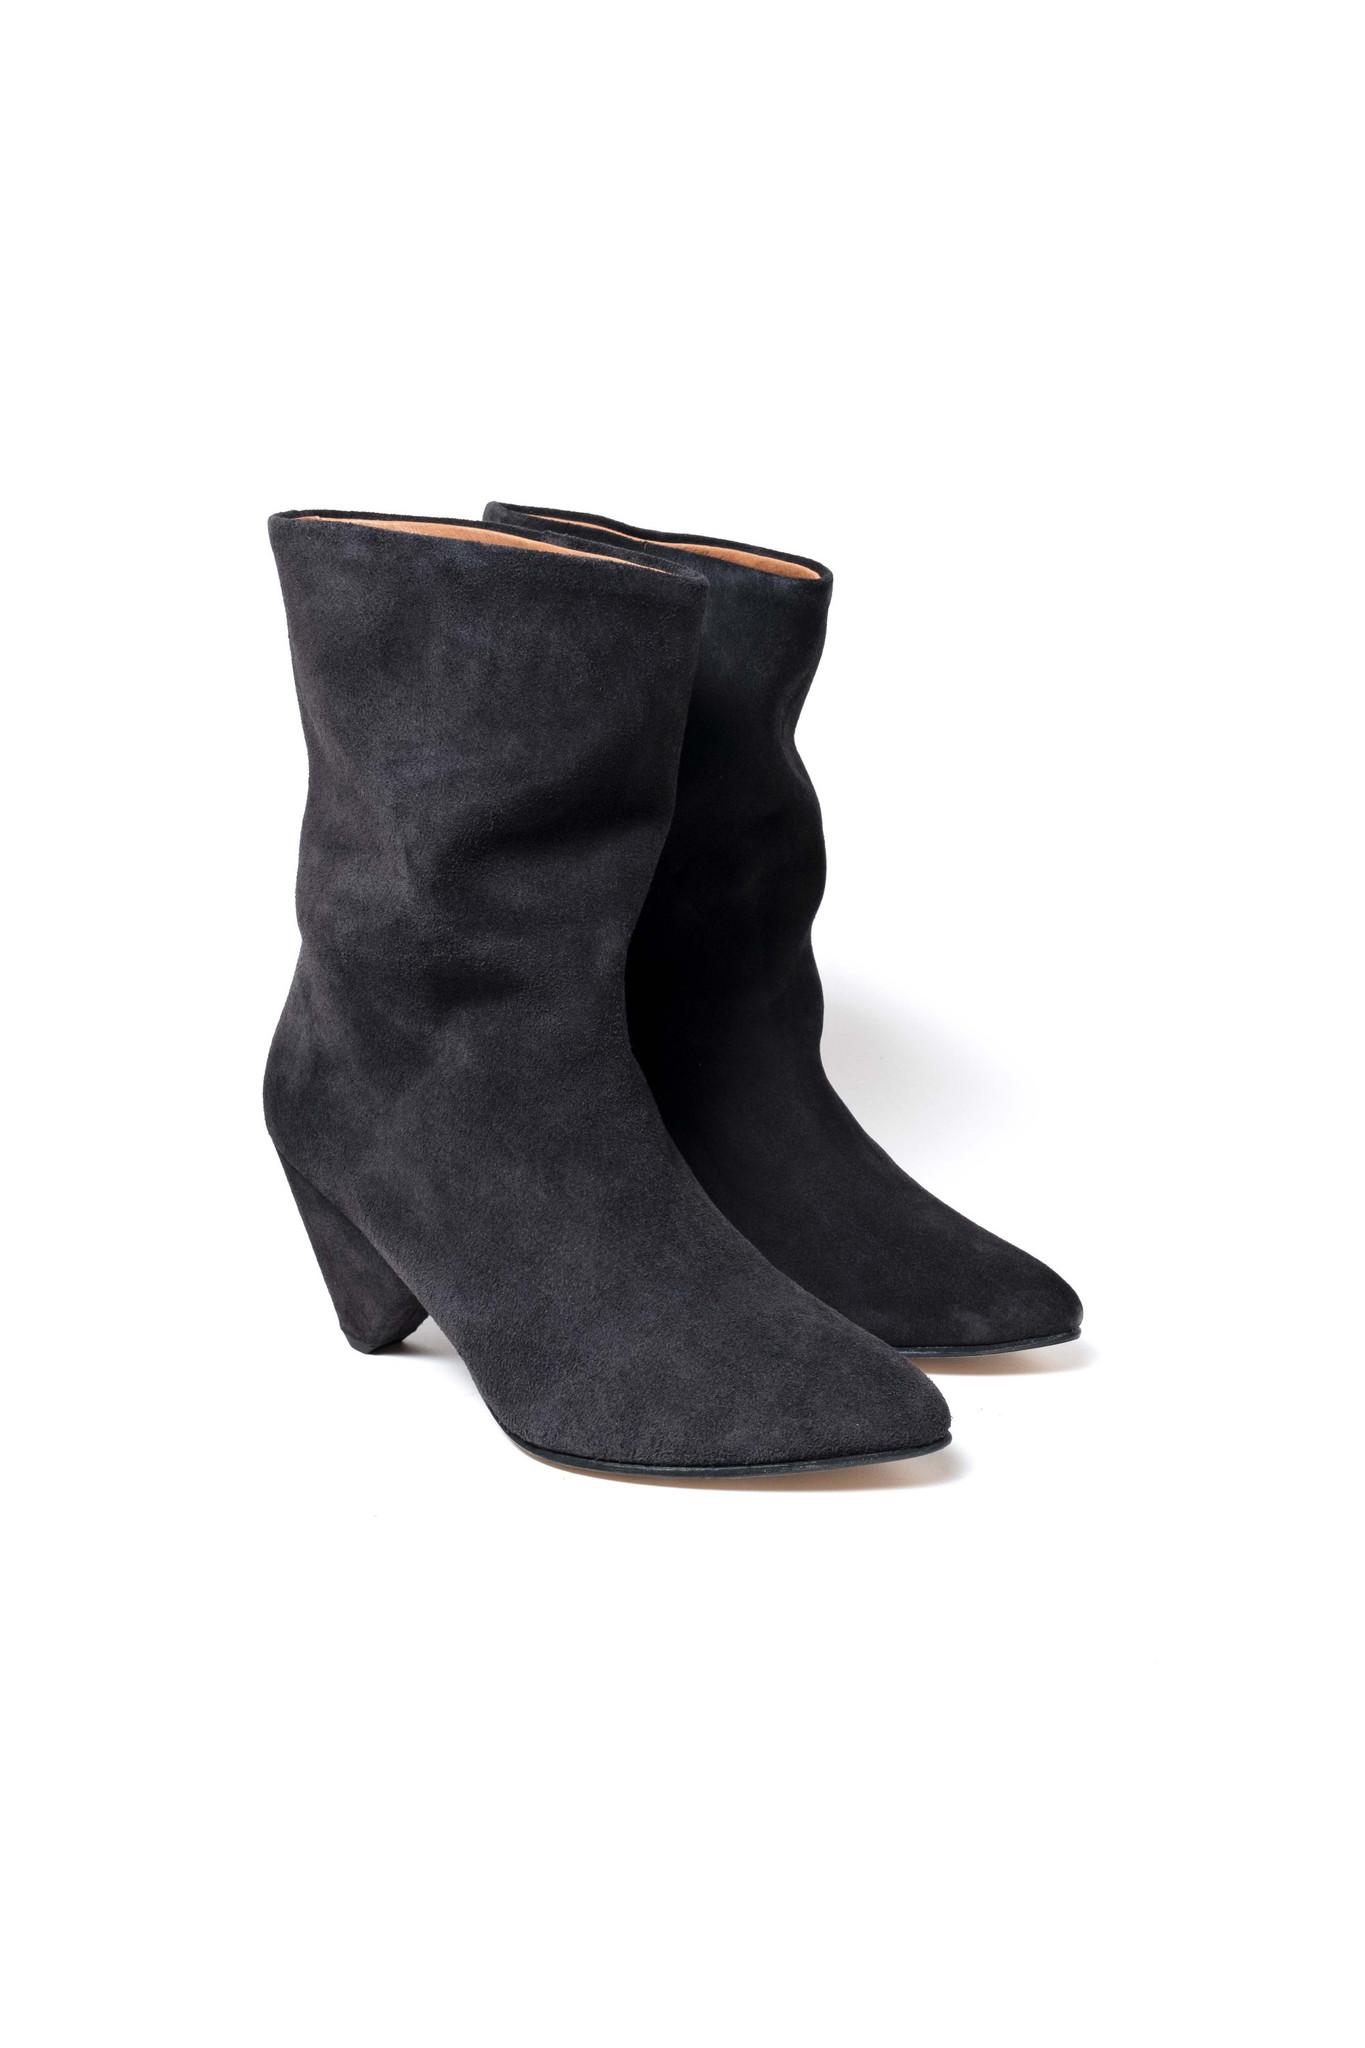 Vully 75 Triangle Calf Suede Boot - Dark Grey 38-3